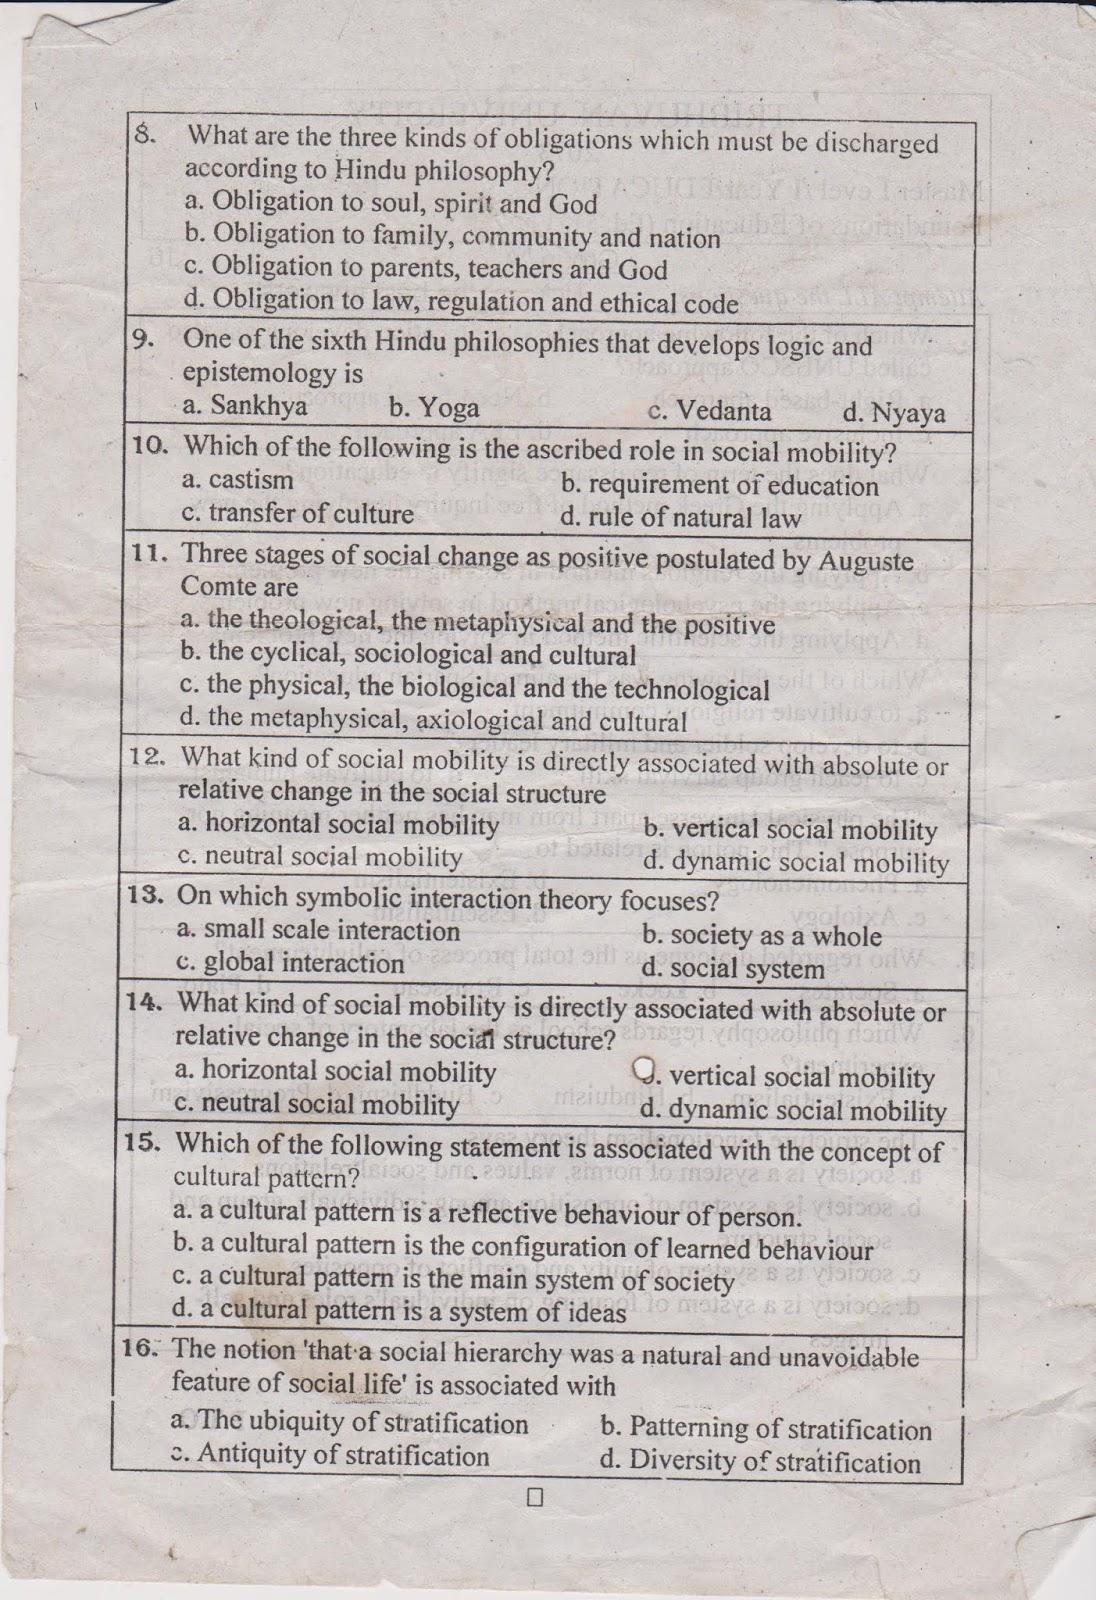 Foundation-Of-Education-Ed512-Question-Paper-2073-Master-Level-I-Year-Education-TU